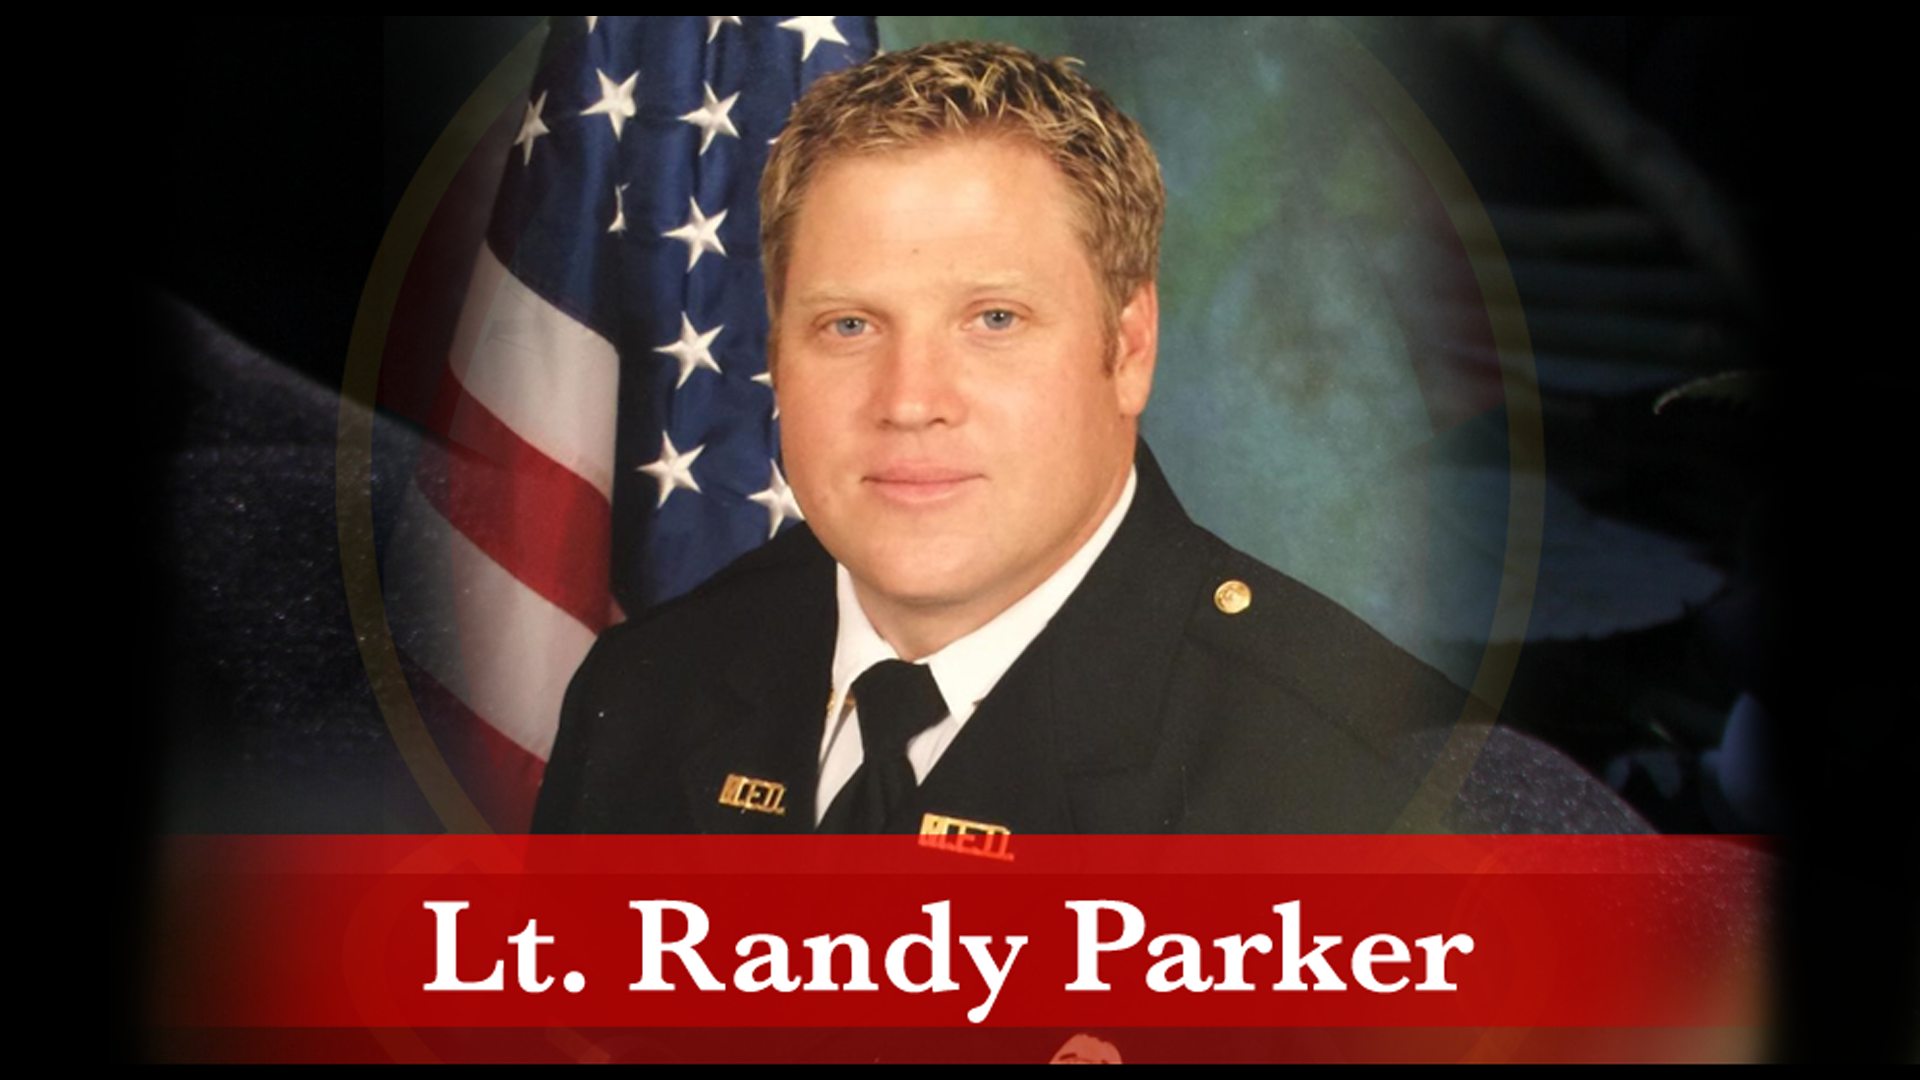 Lt. Randy Parker